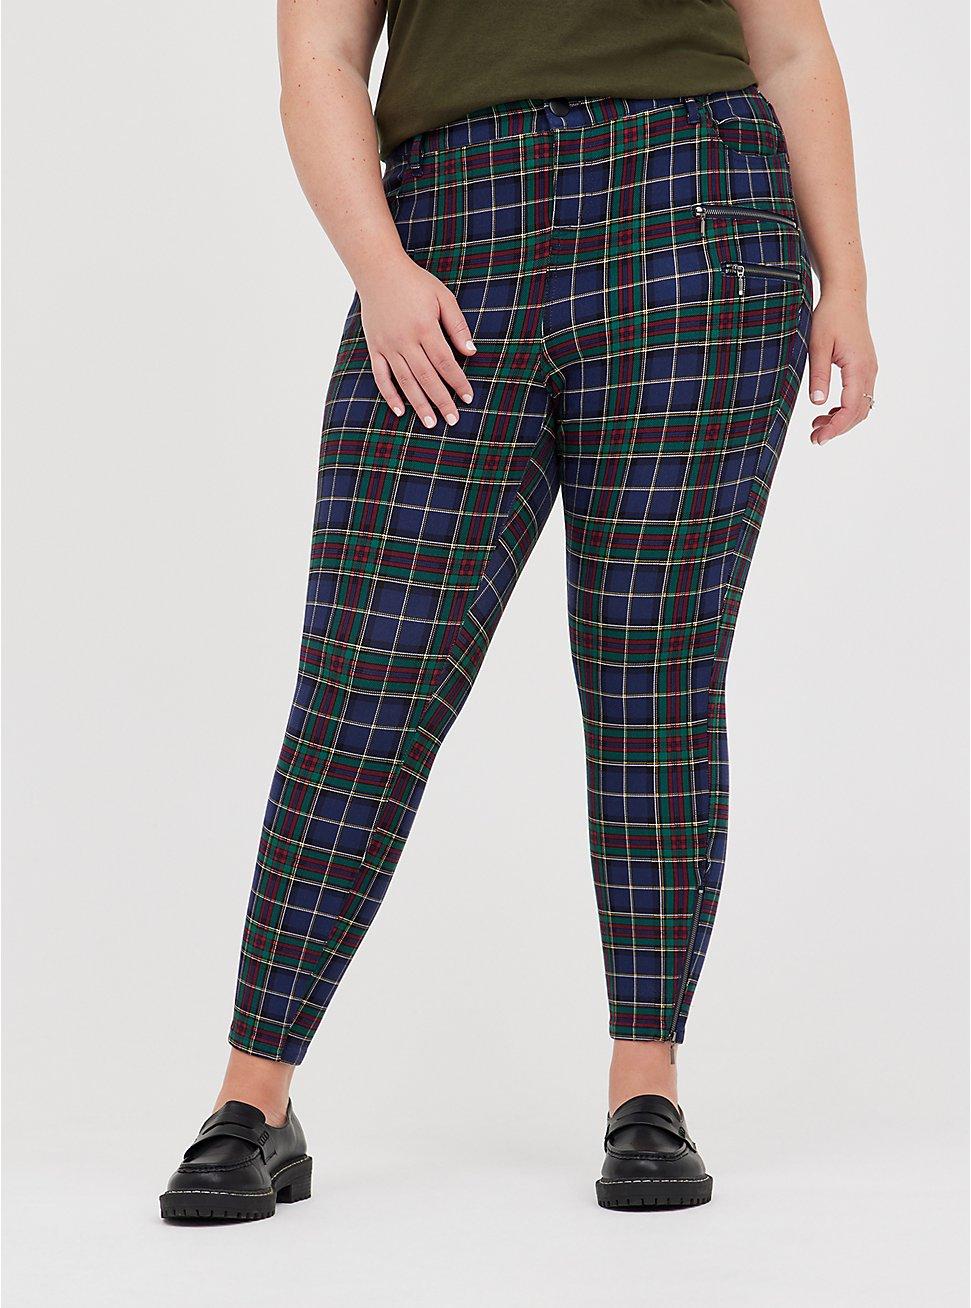 Zip Skinny Pant - Luxe Ponte Tartan Plaid, OTHER PRINTS, hi-res